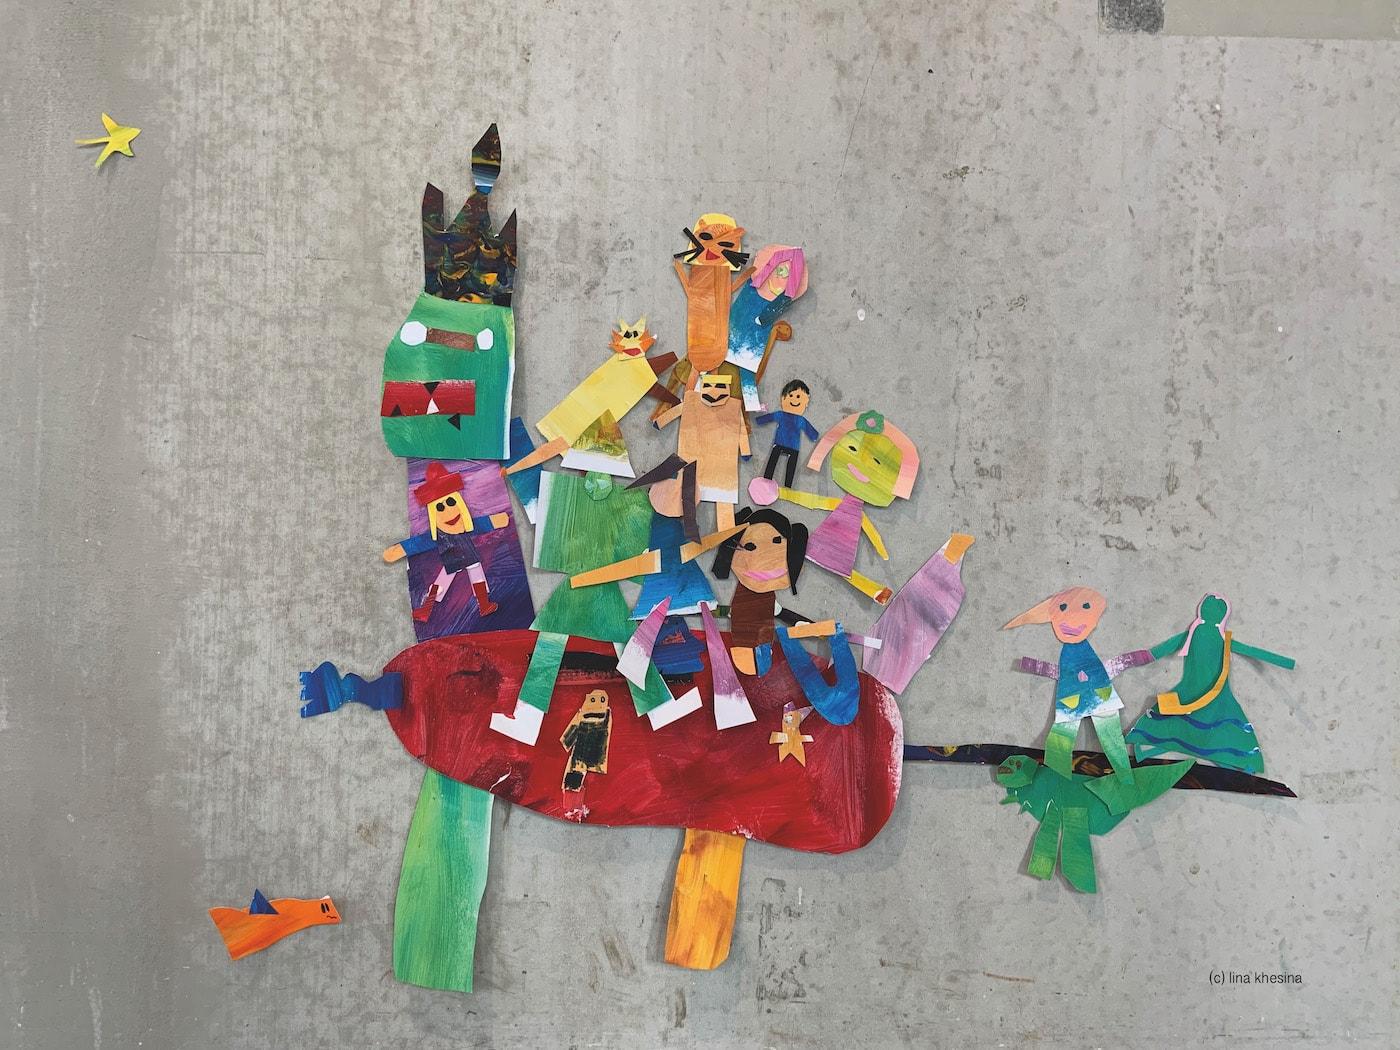 kreativer Bastel-Kindergeburtstag bei den Zuckerwattenkrawatten in Berlin im Grundschulalter c Lina Khesina // HIMBEER